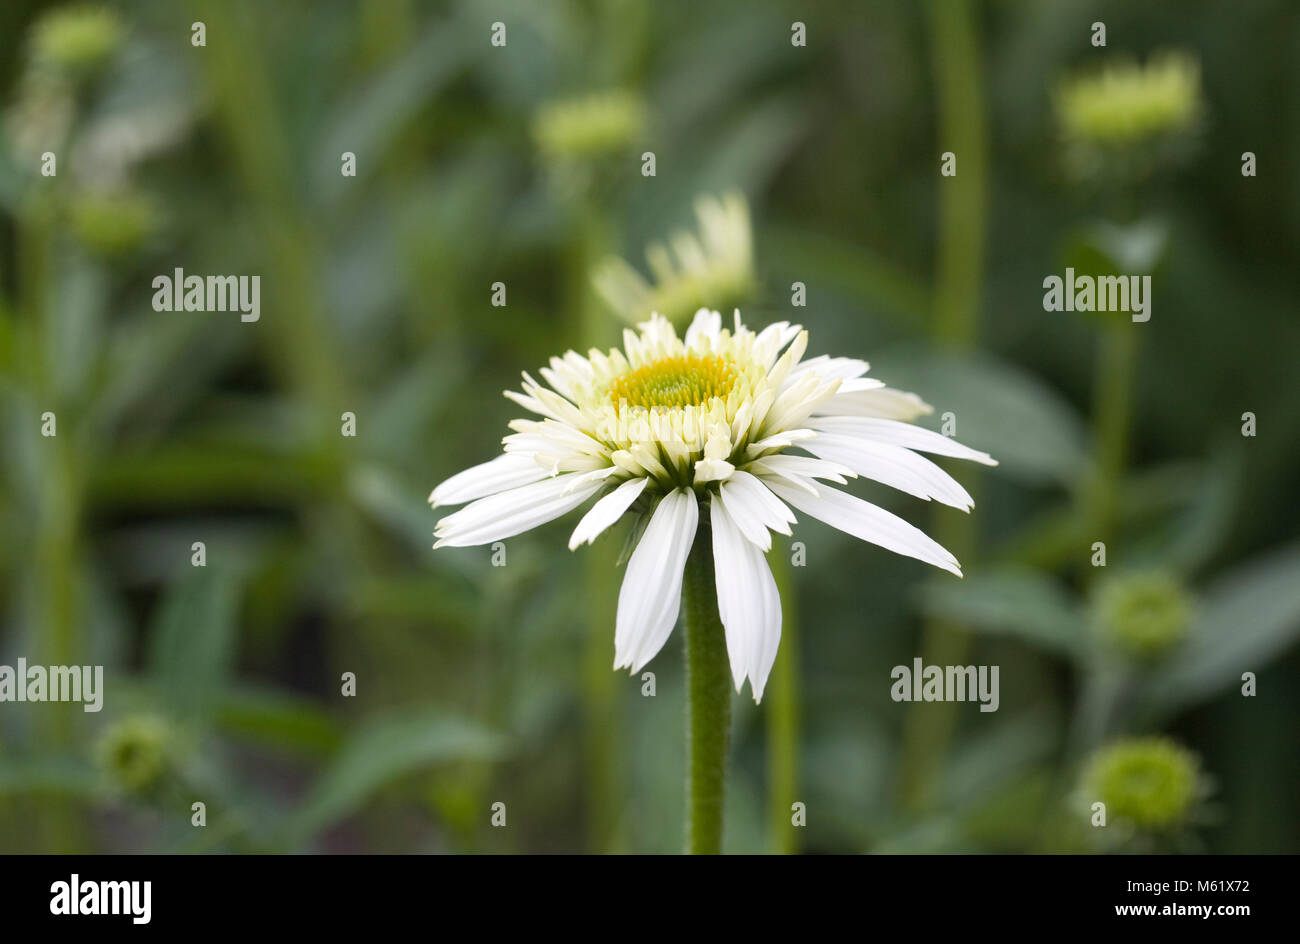 Echinacea purpurea flower. - Stock Image